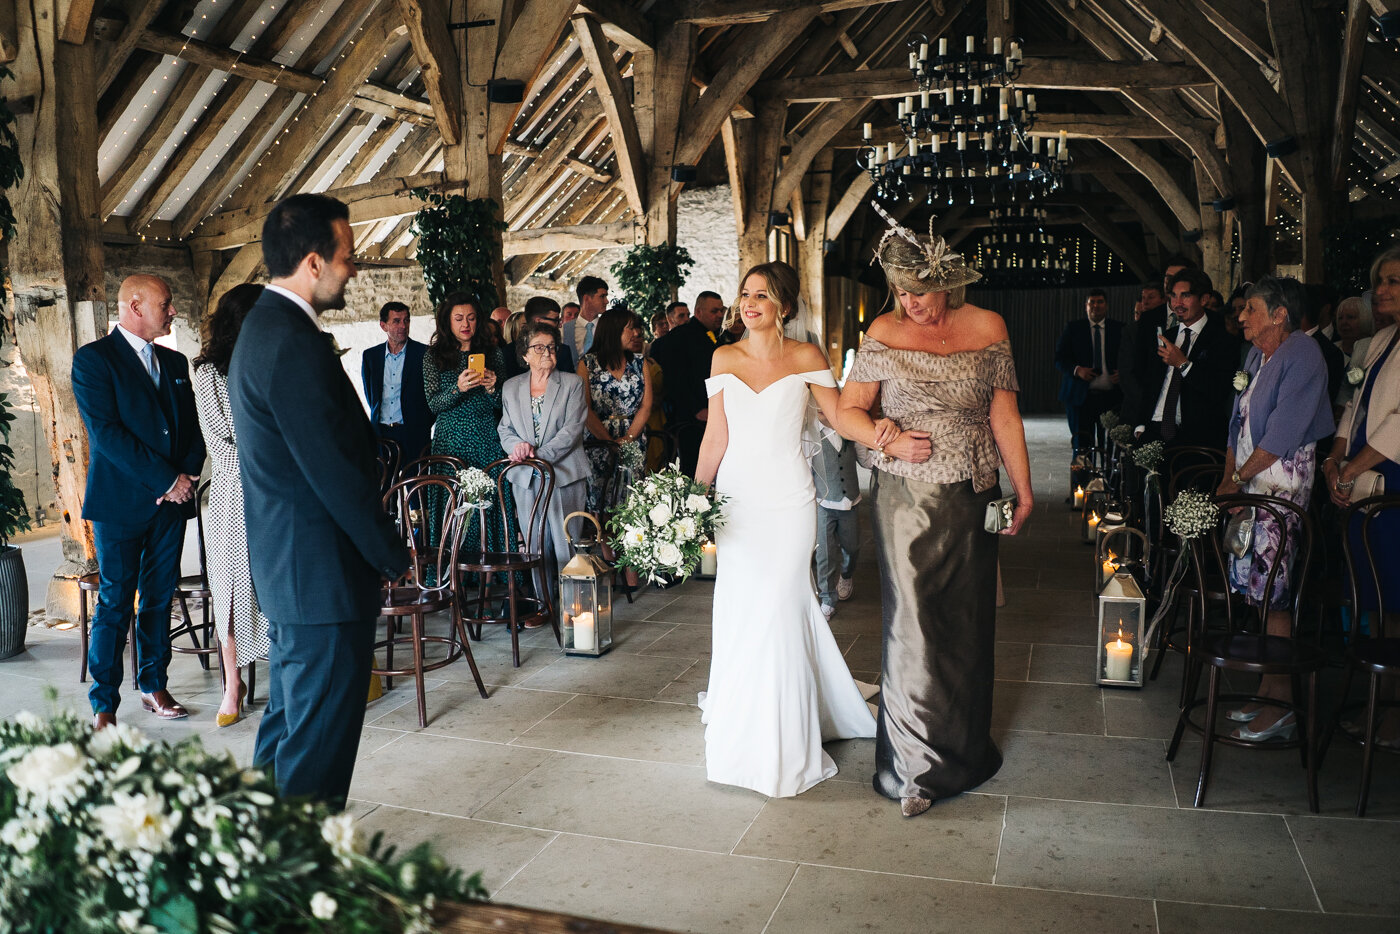 tithe-barn-bolton-abbey-north-yorkshire-cripps-wedding-photographer-creative-0021.jpg